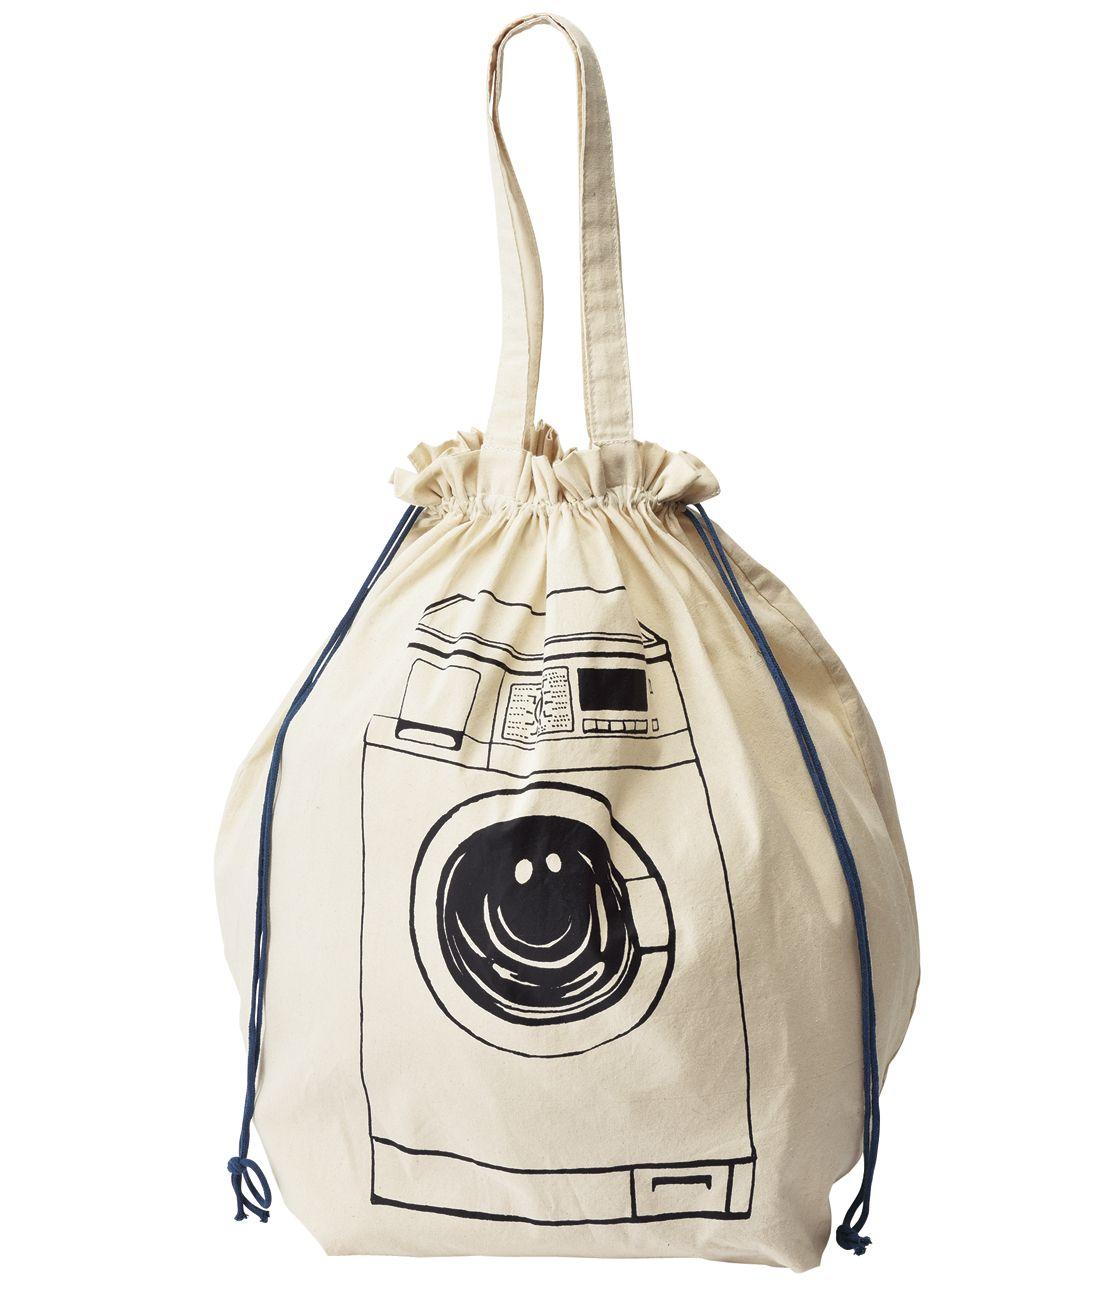 Catherine DrawString bag